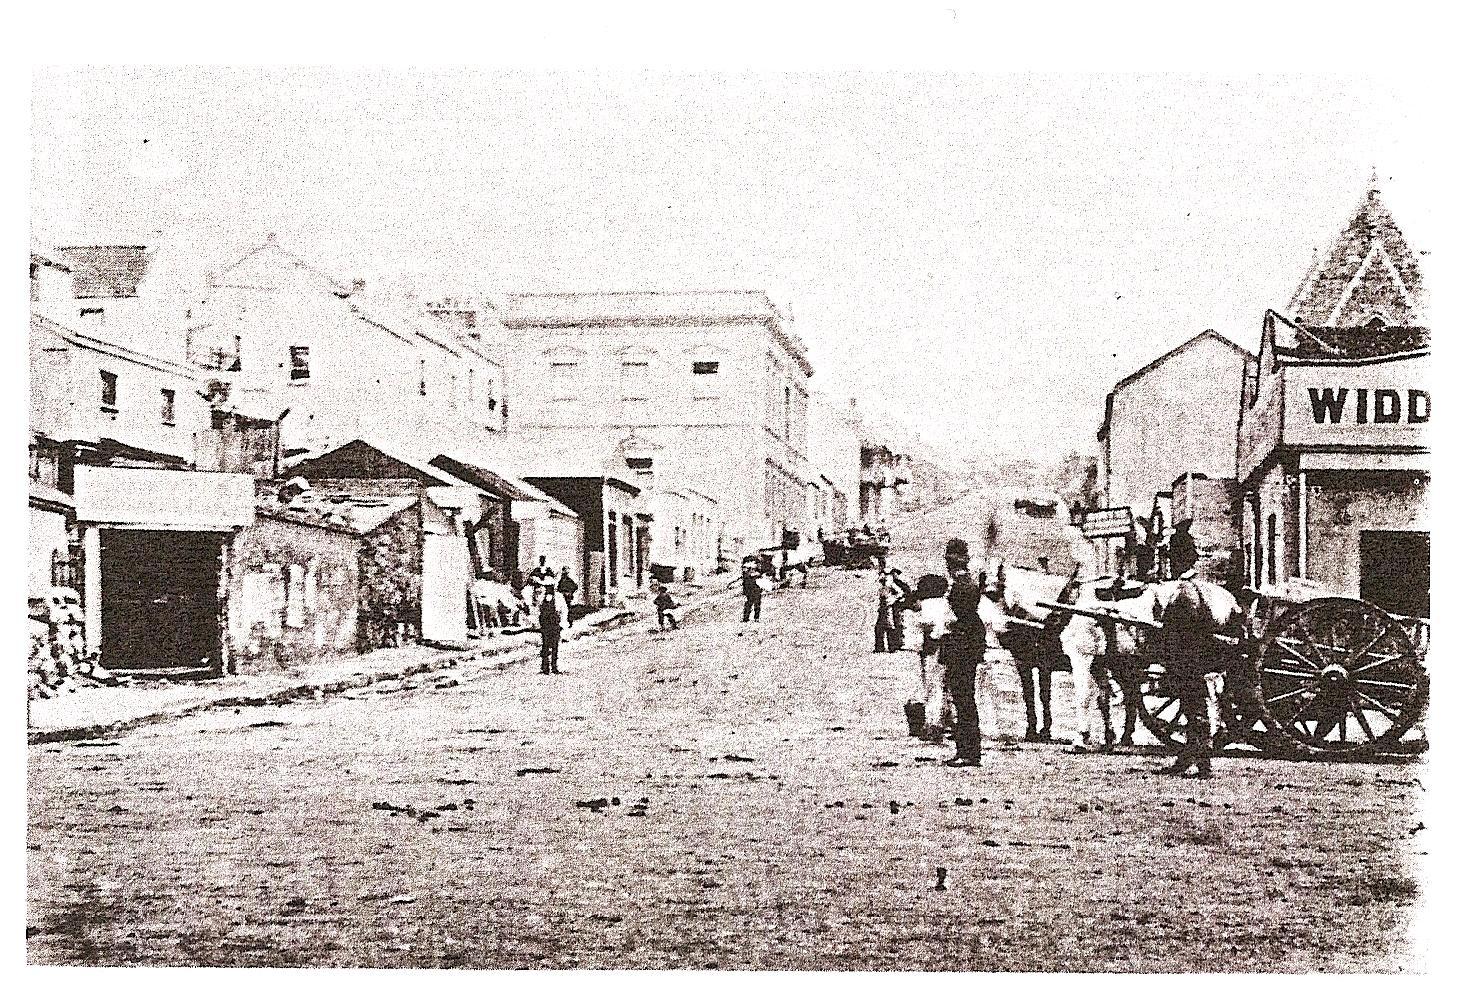 Russel Road Port Elizabeth in 1863